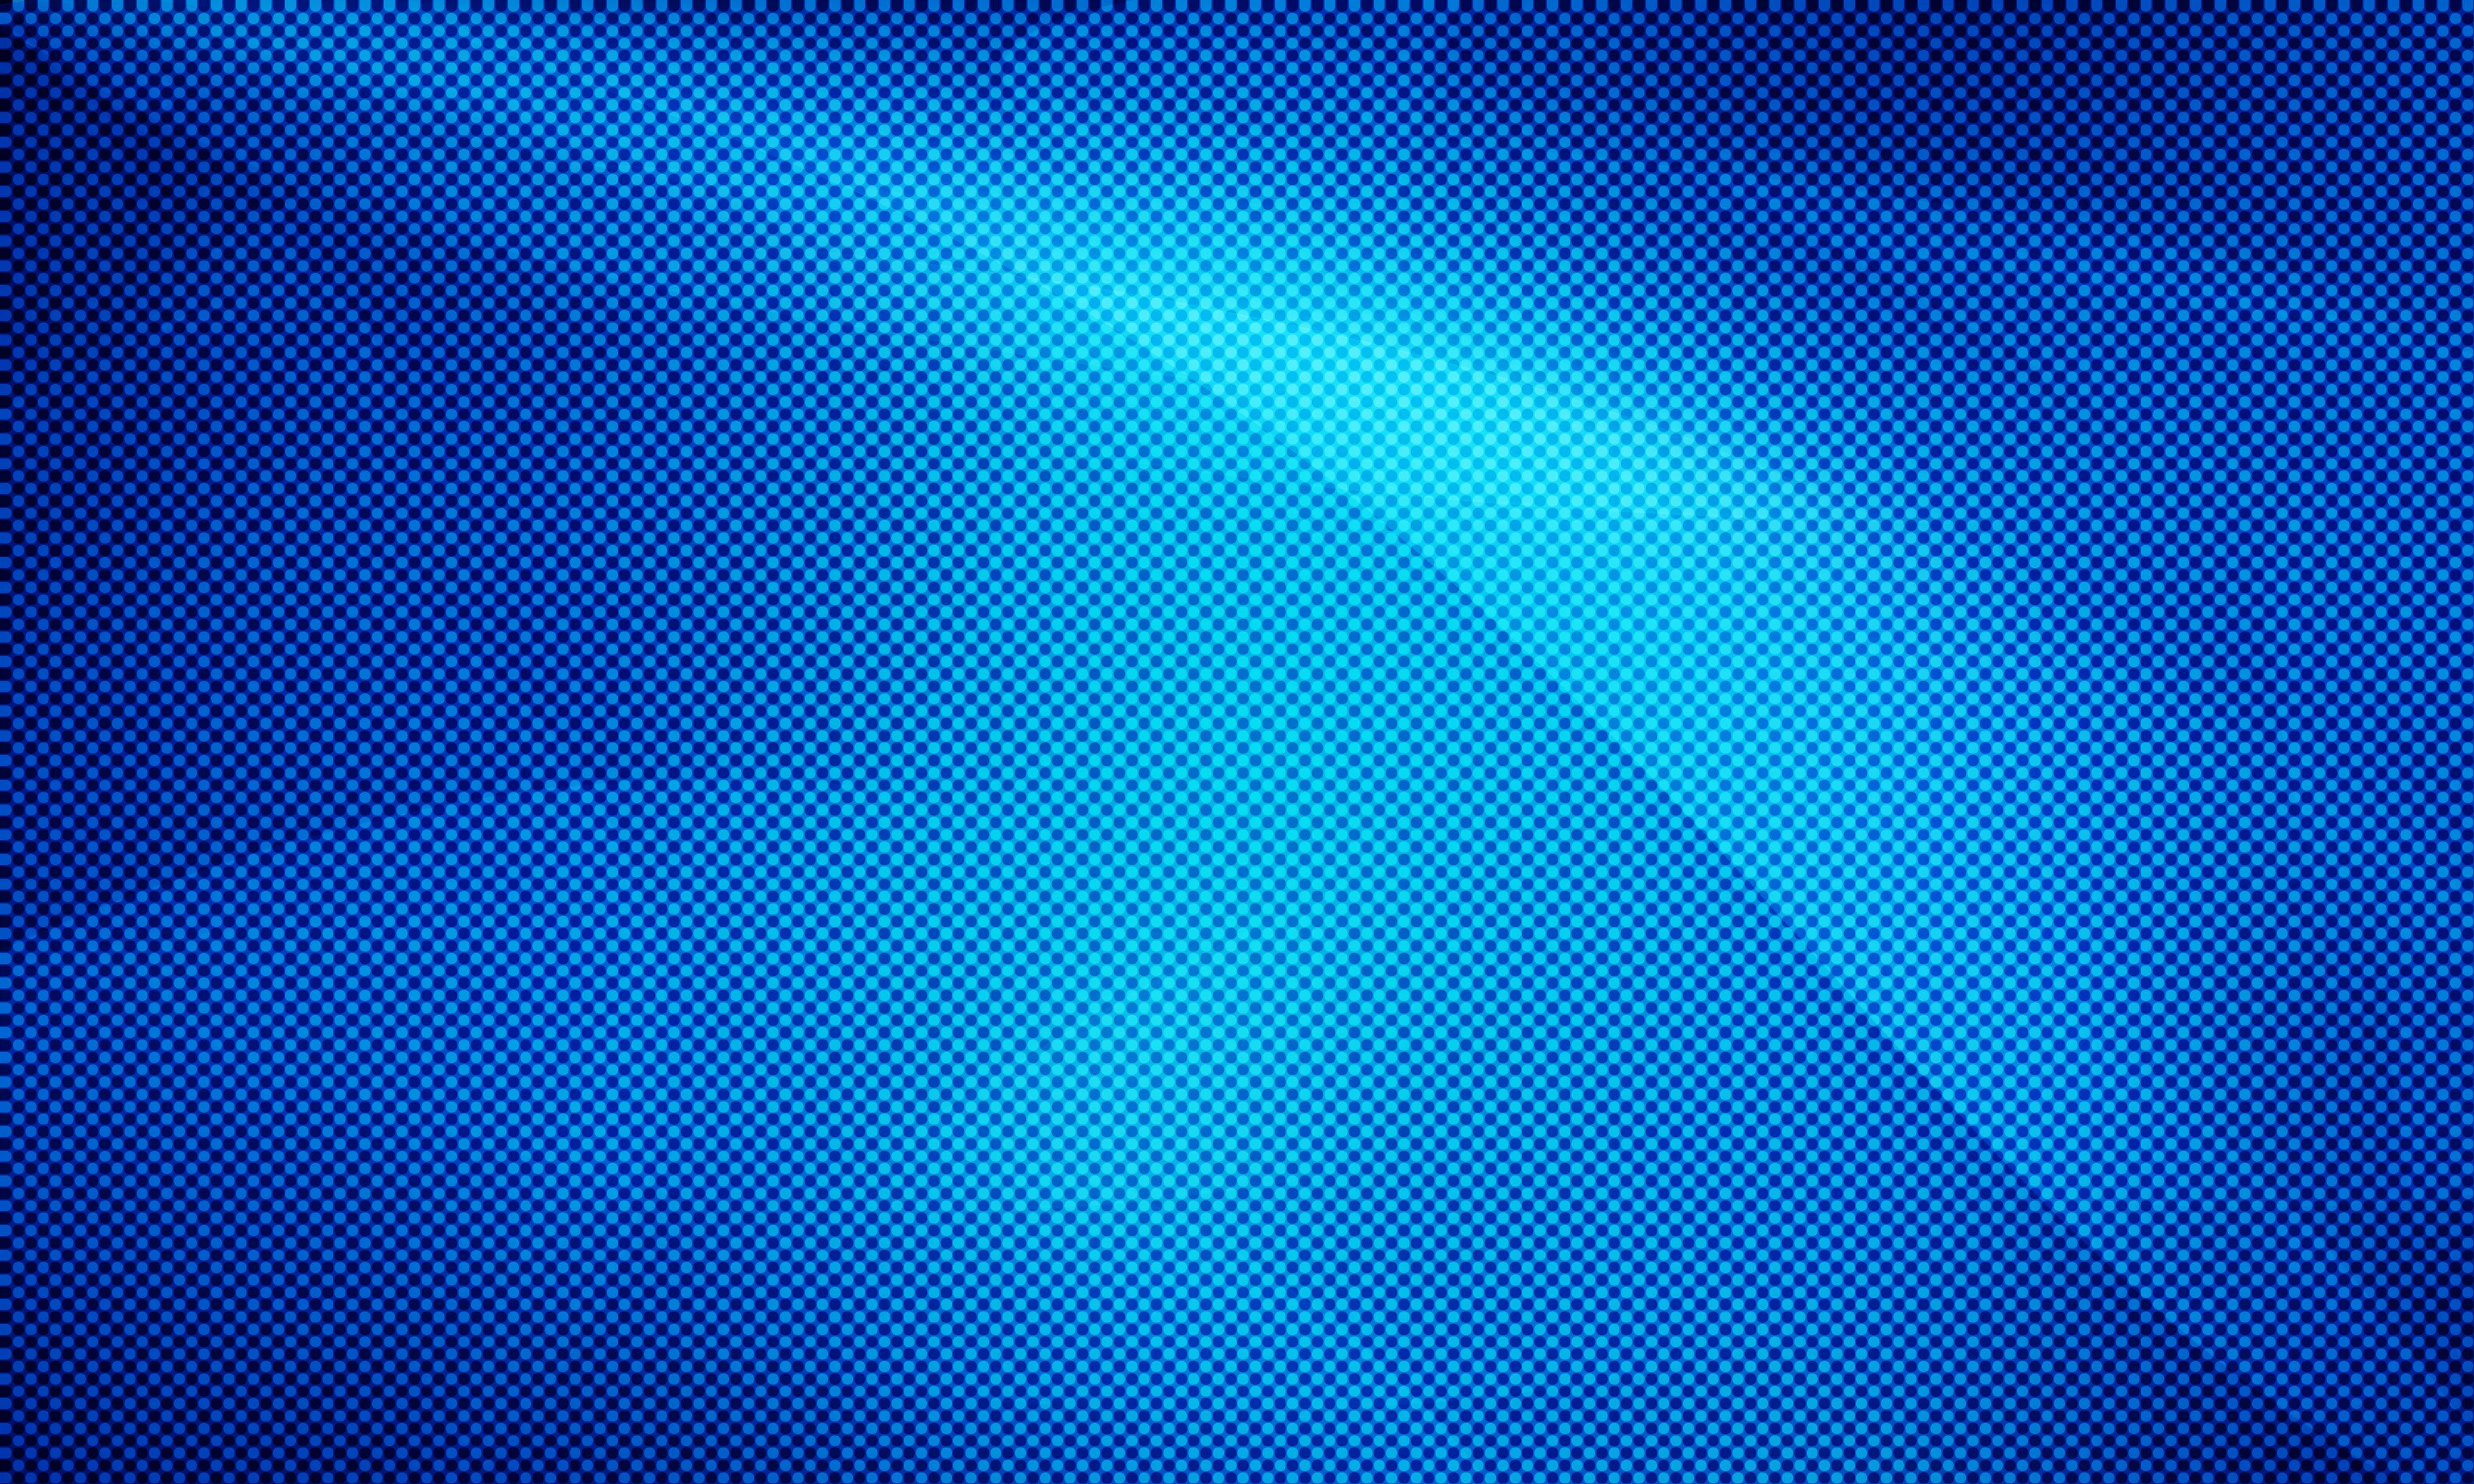 just another blue abstract background wwwmyfreetexturescom 1500 5000x3000